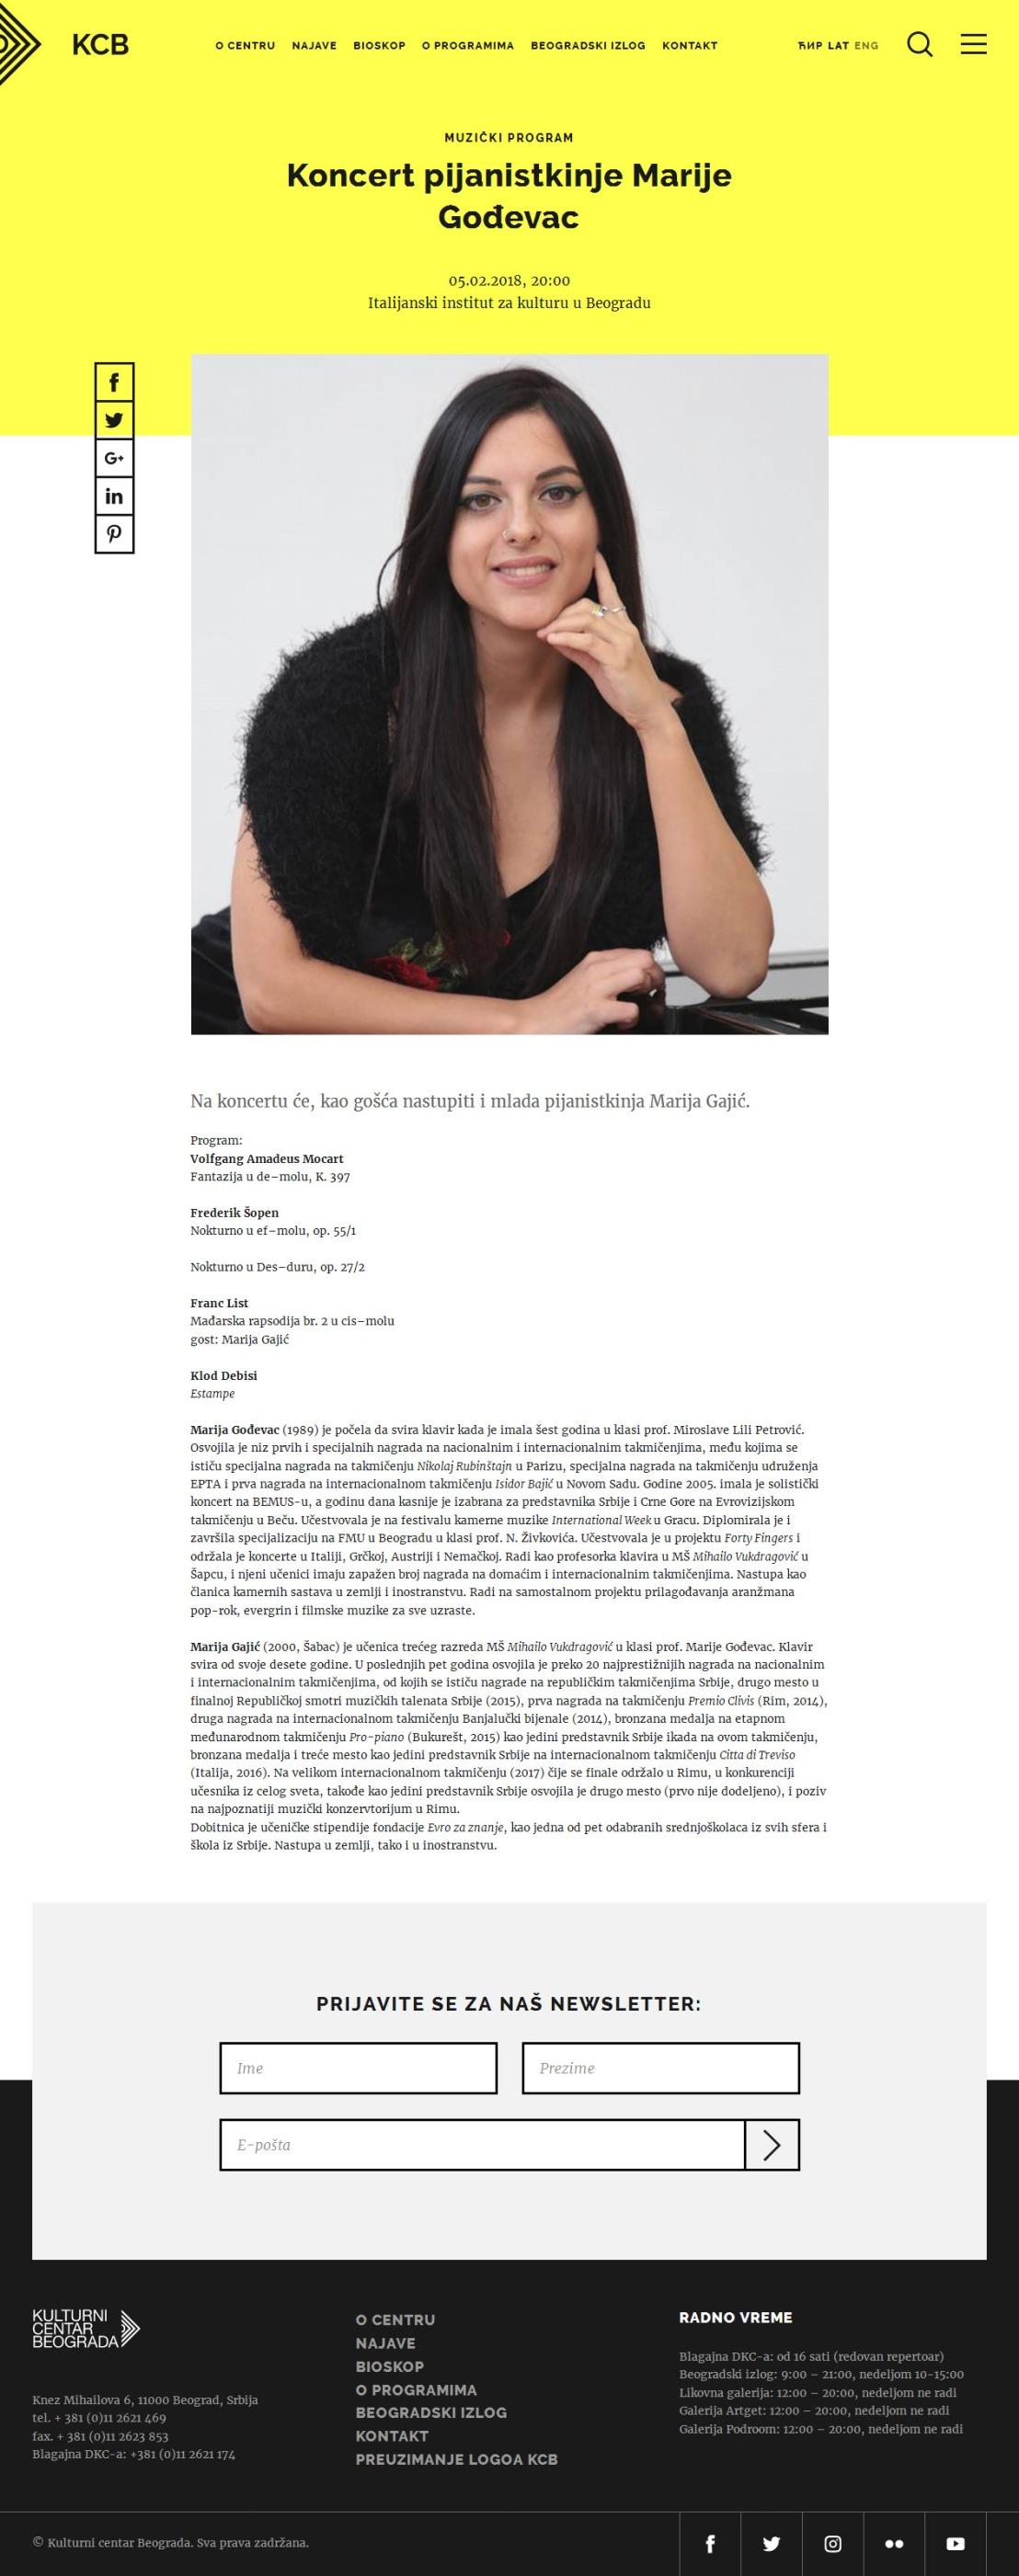 0502 - kcb.org.rs - Koncert pijanistkinje Marije Godjevac